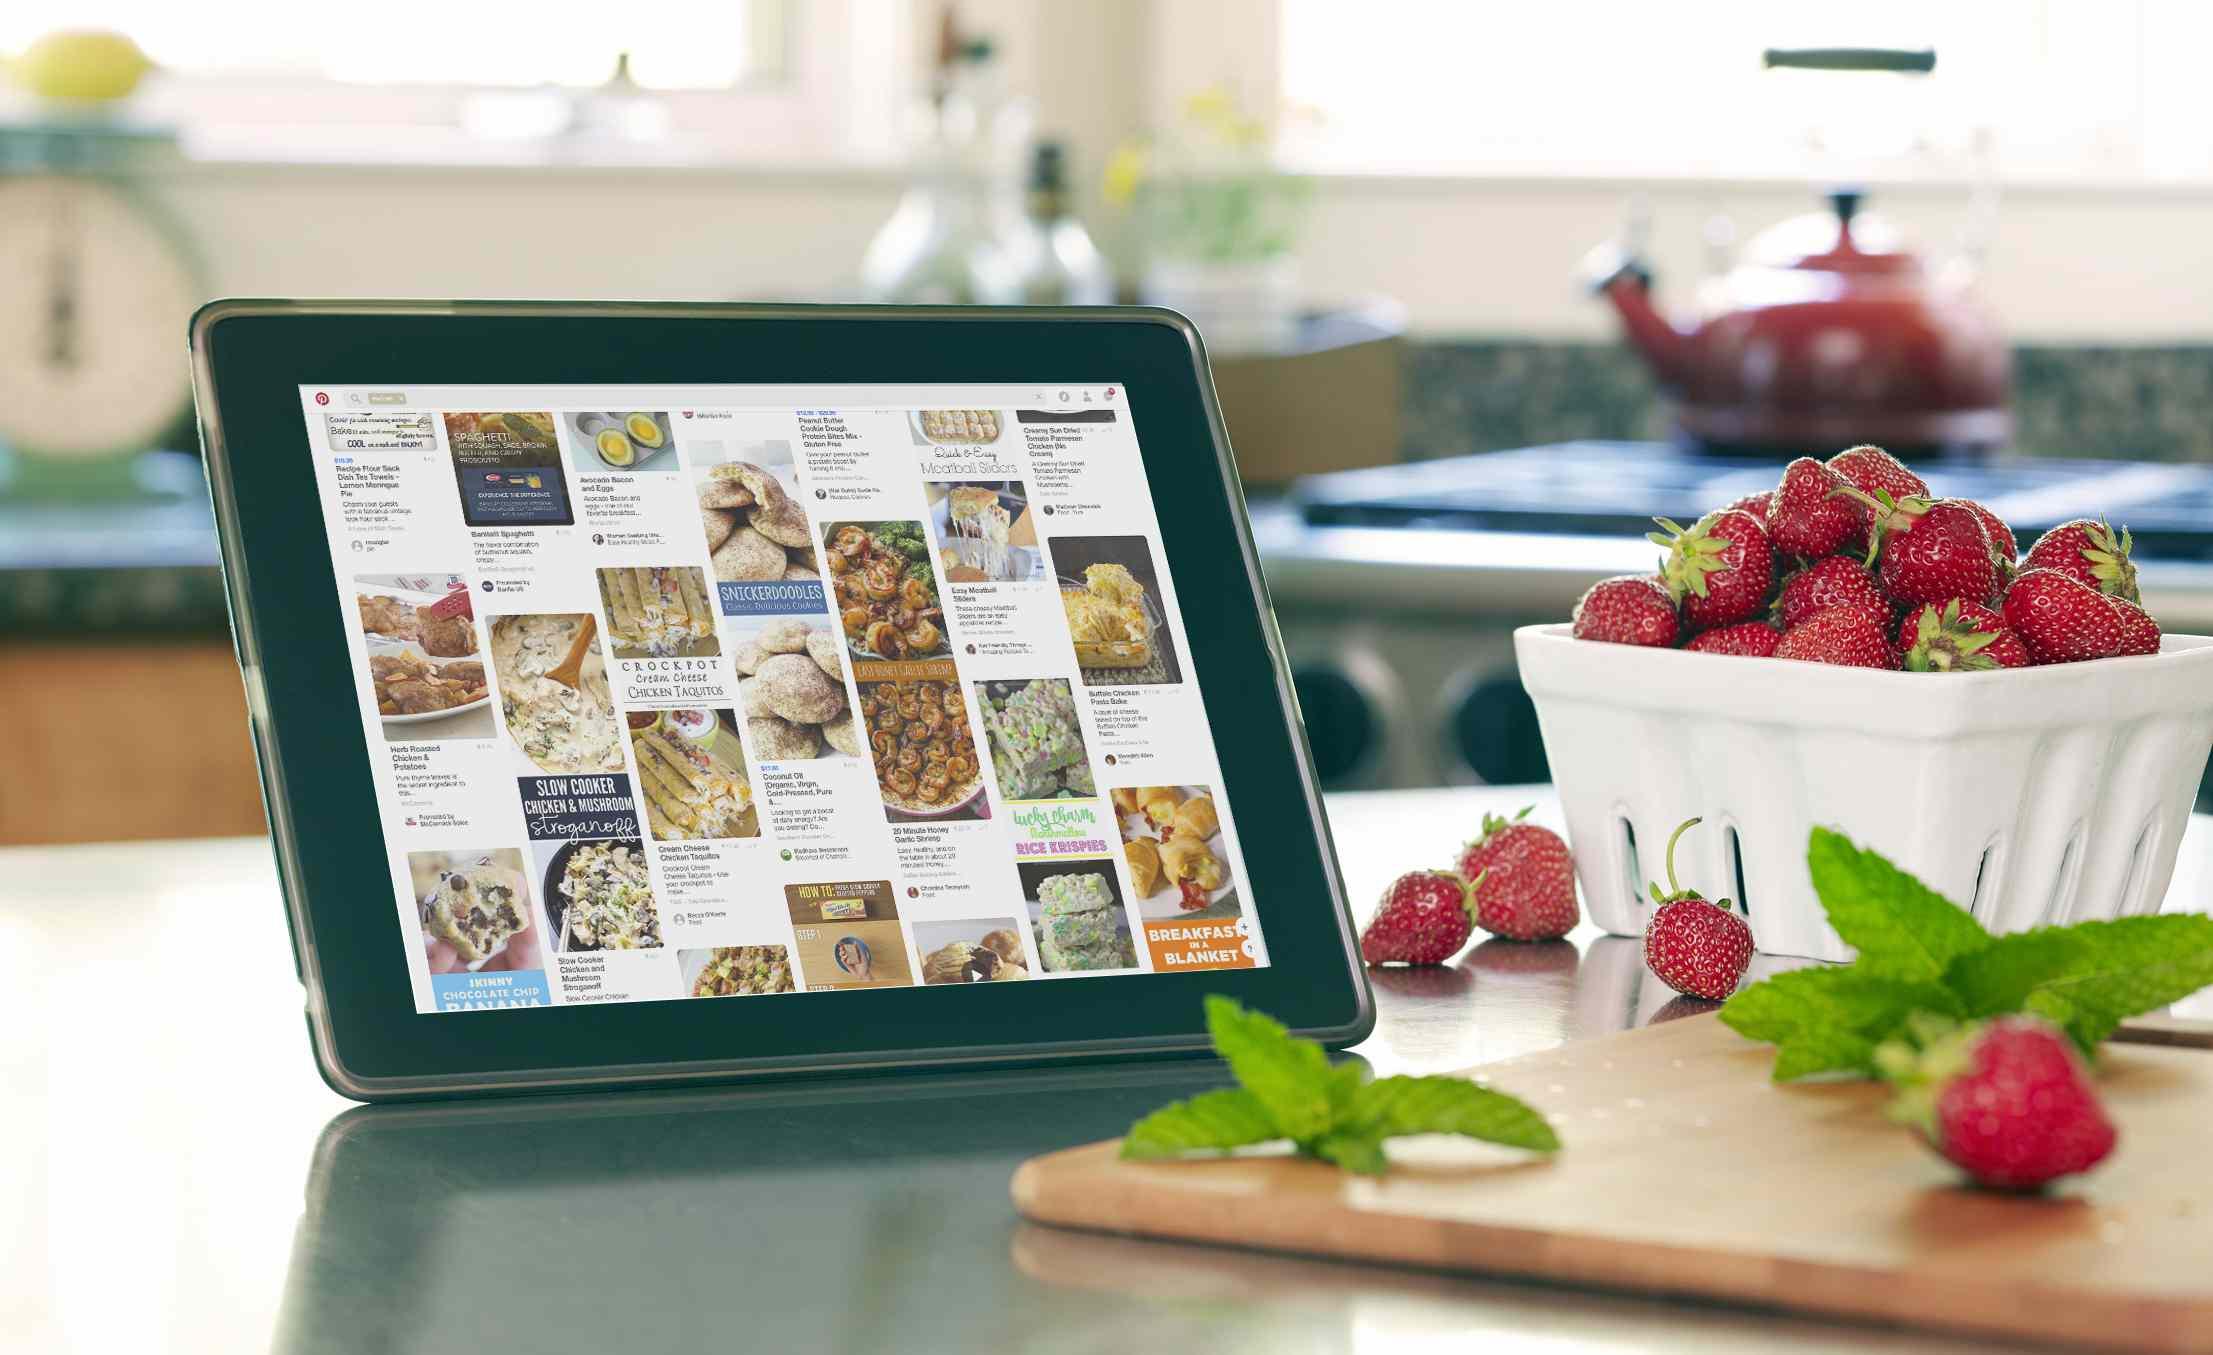 Pinterest on tablet in kitchen